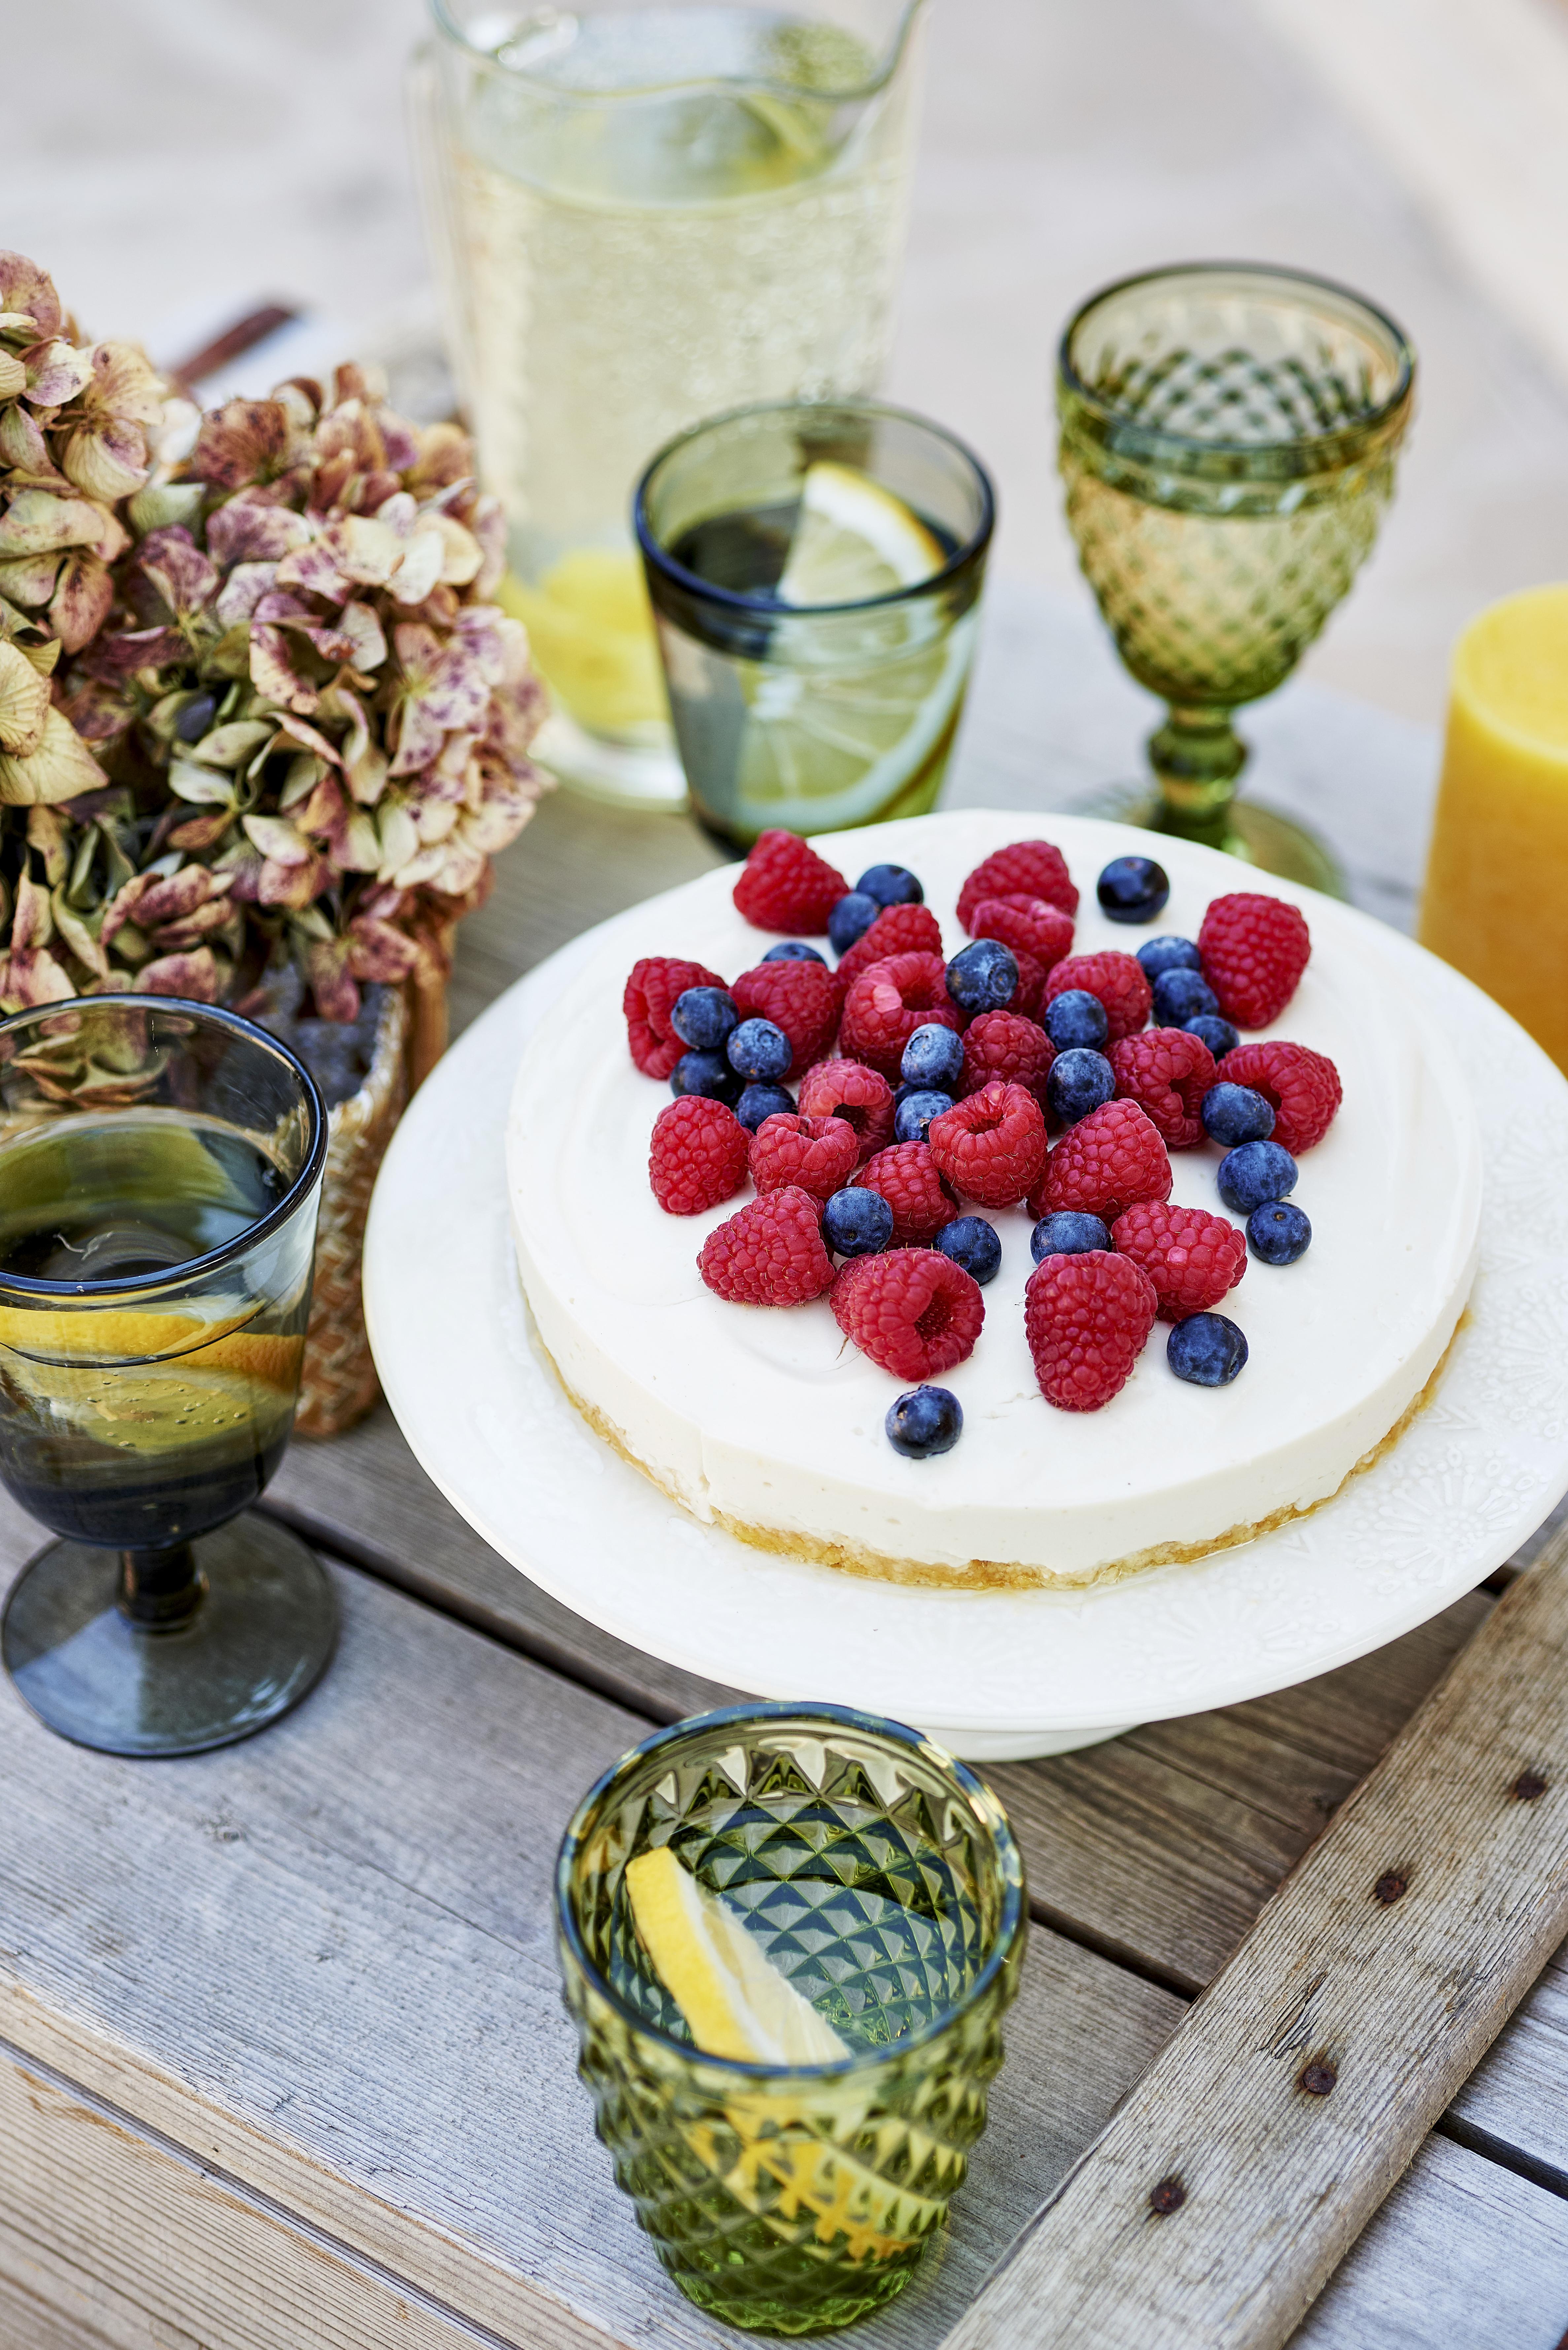 photo culinaire d'un cheesecake à la framboise